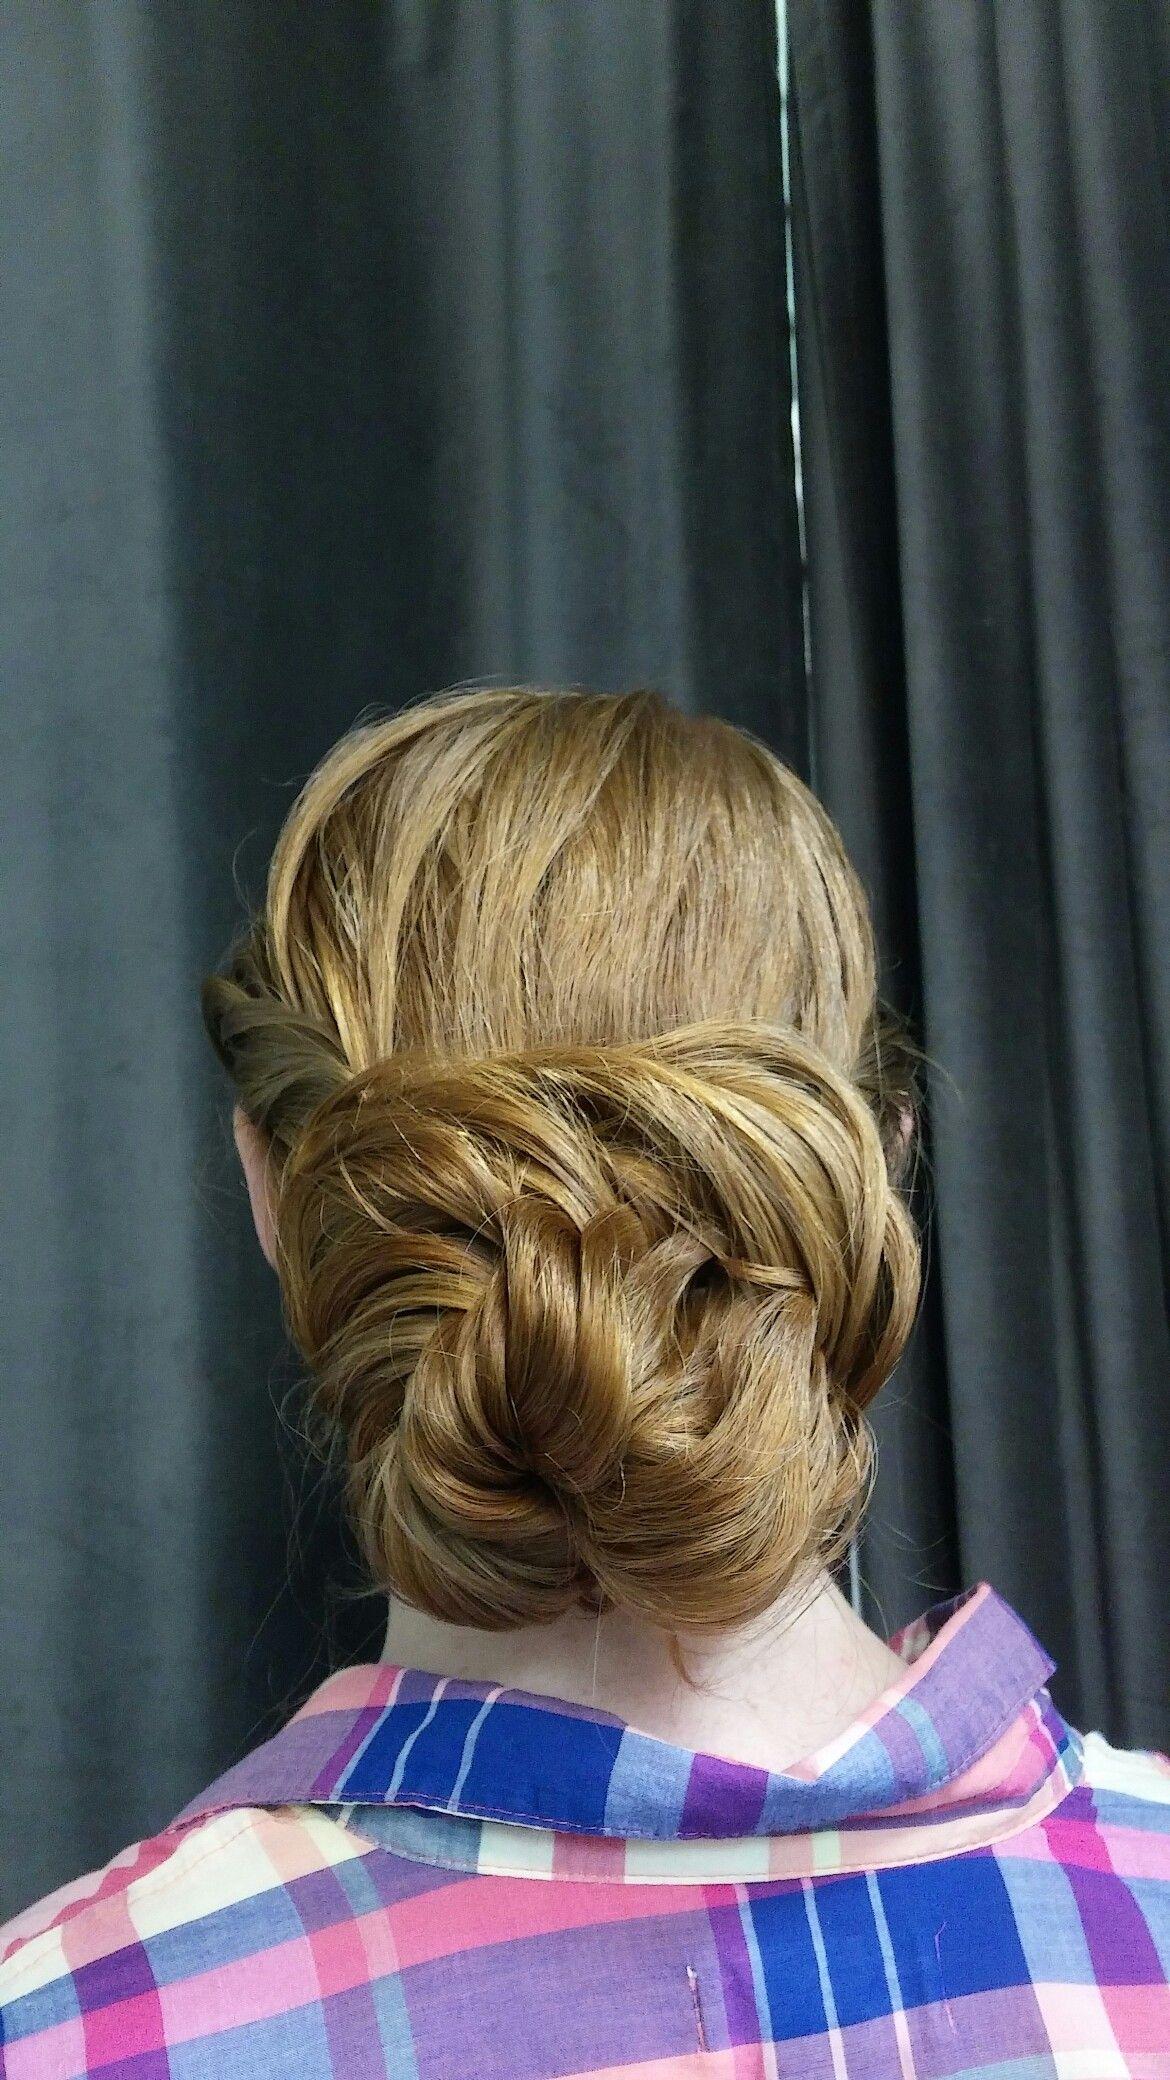 Braided bun updo by bev of salon pasca hair u beauty pinterest